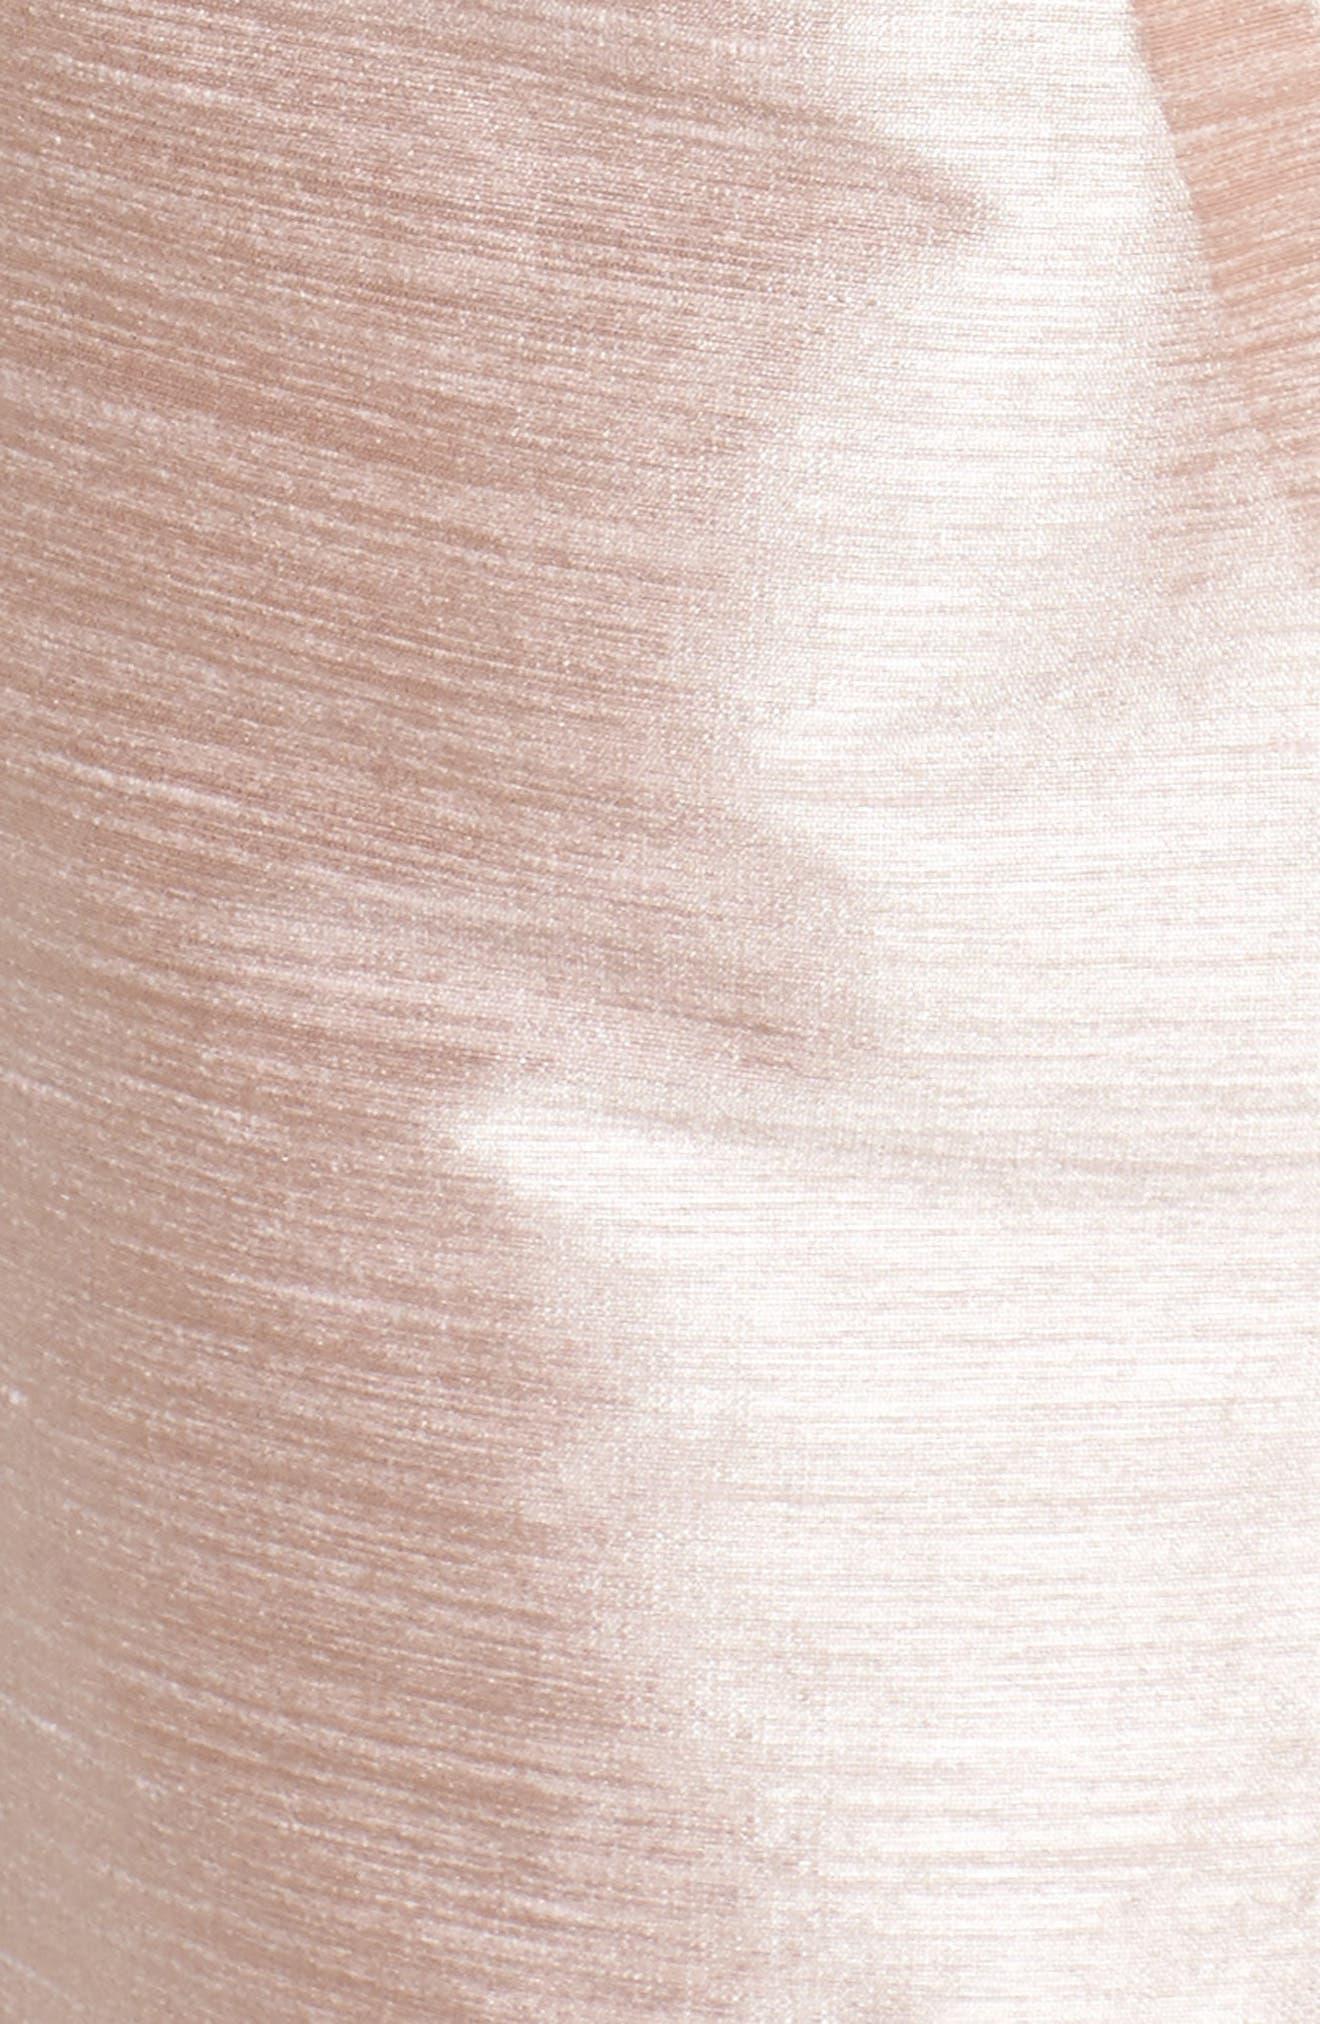 Boatneck Sheath Dress,                             Alternate thumbnail 5, color,                             Pearl Pink